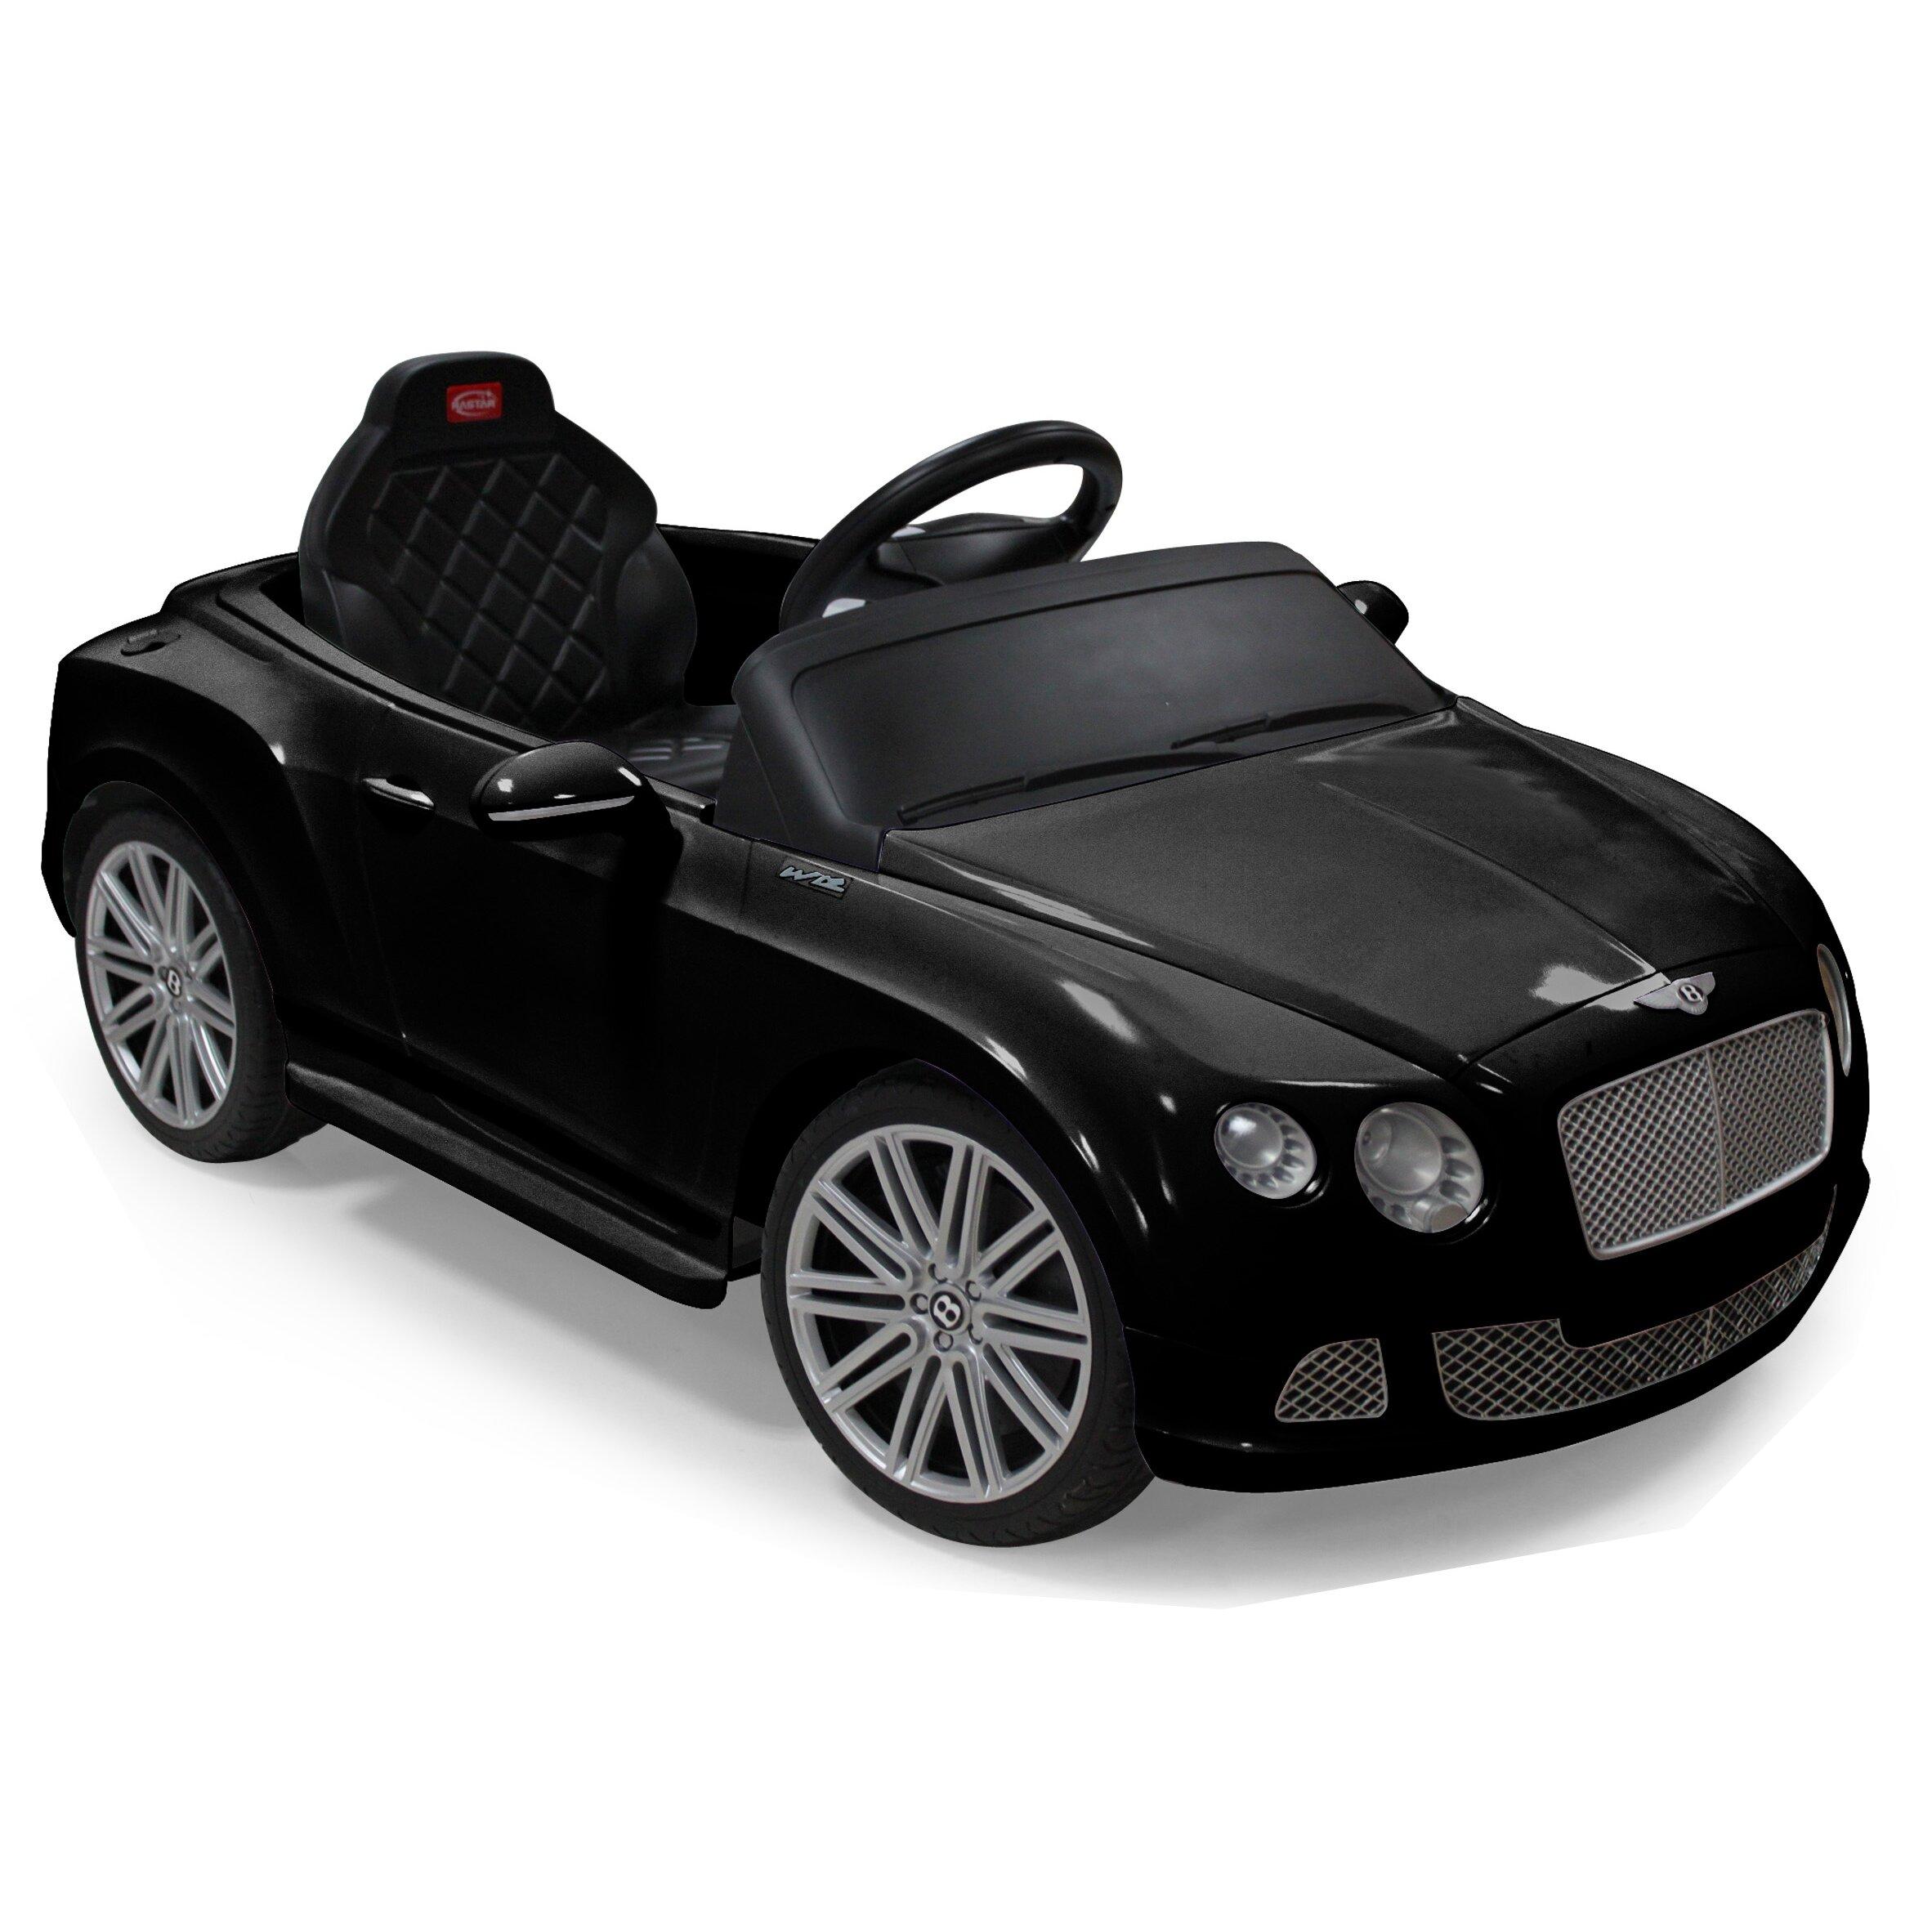 Storm Two Seater Car Vroom Rider Bentley Gtc Rastar V Battery Powered